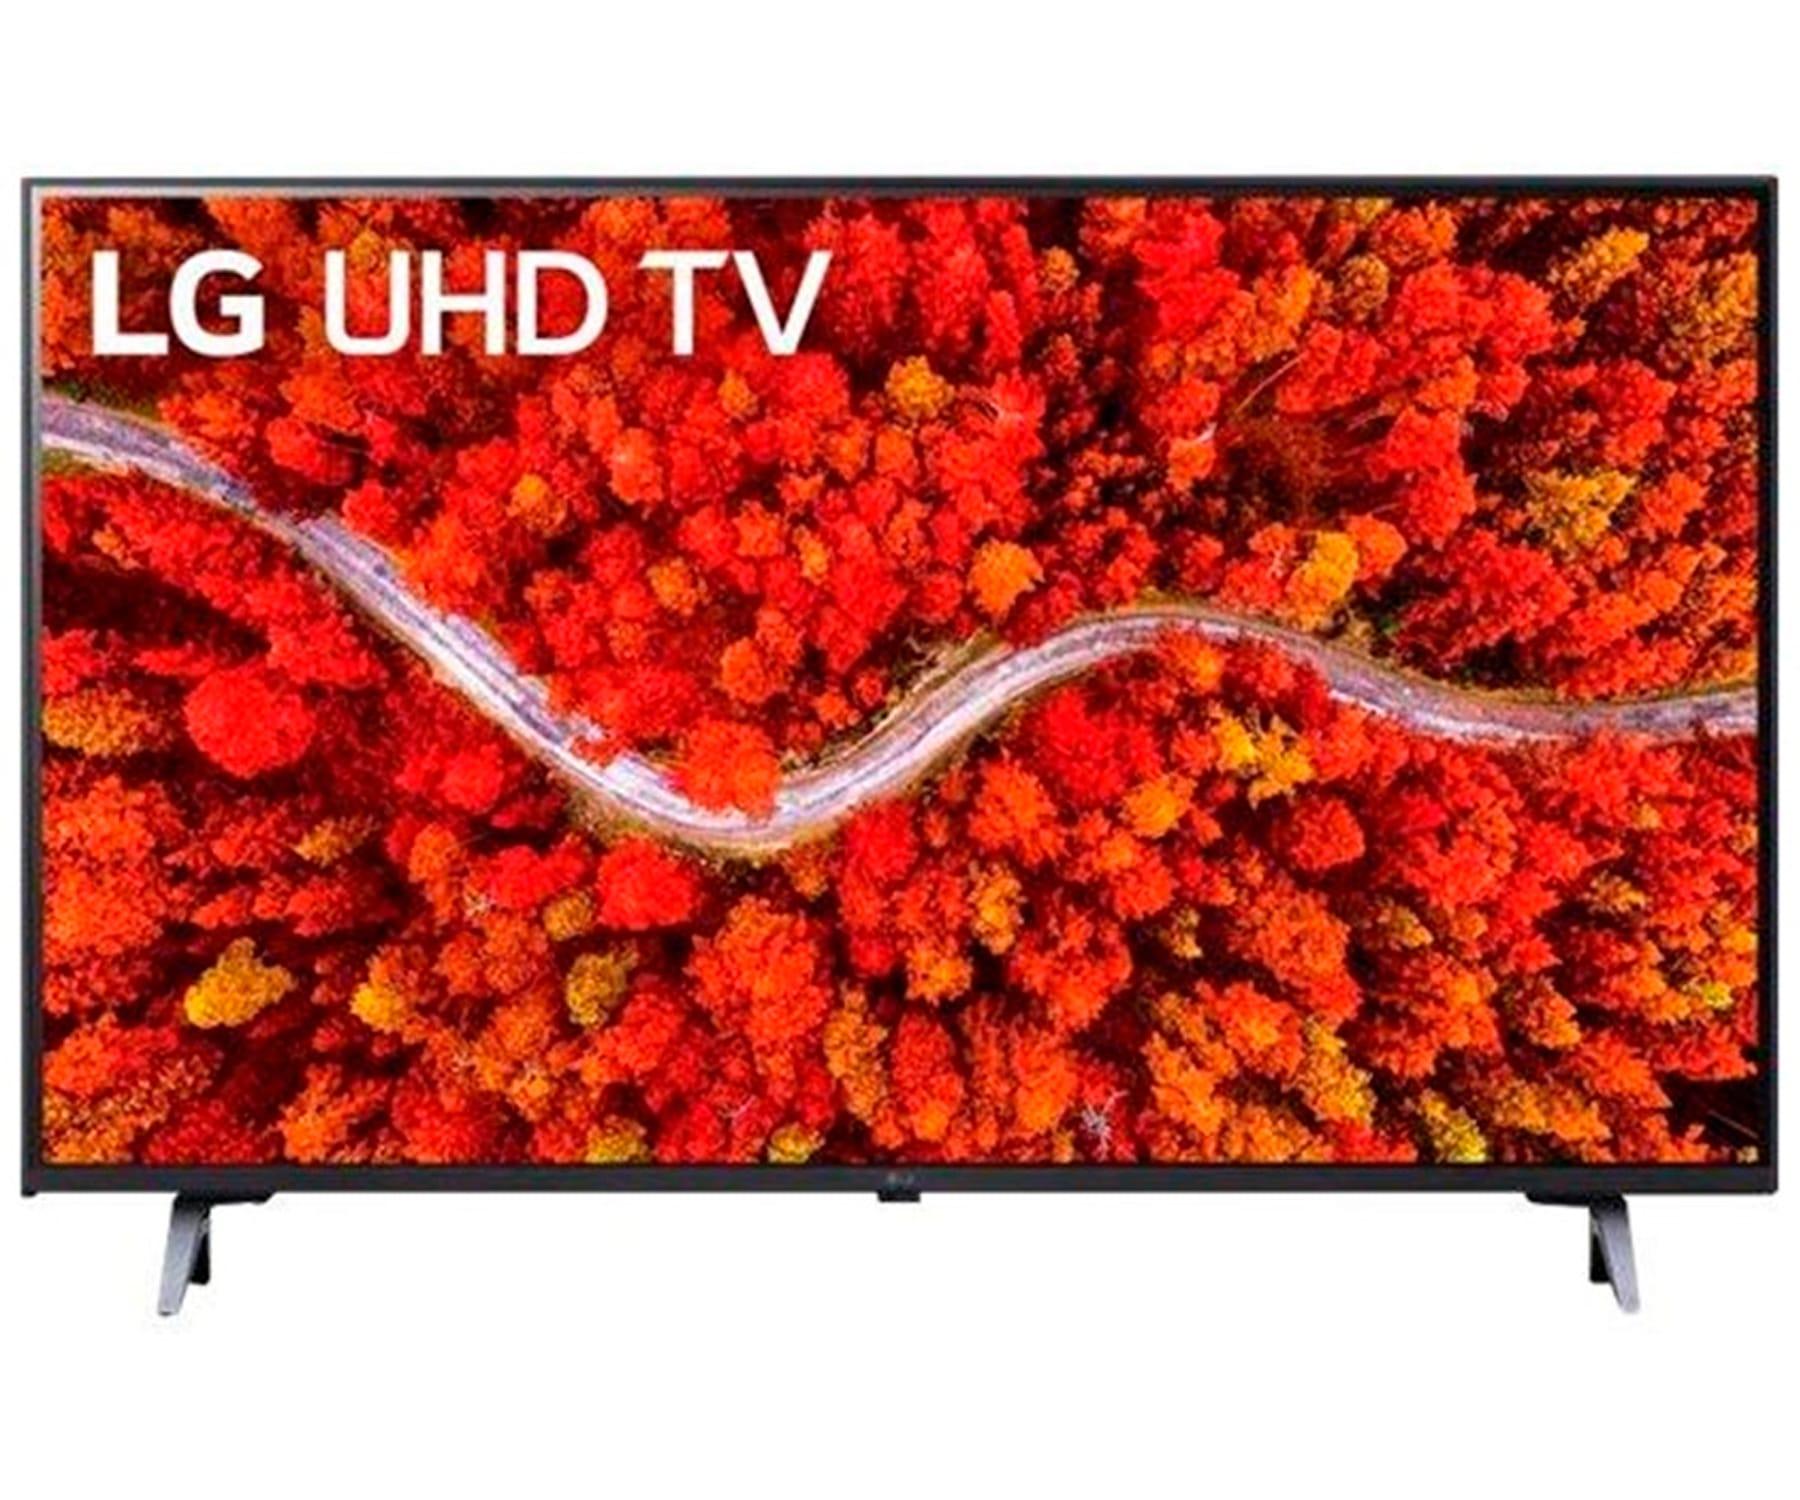 "LG 43UP80003LA TELEVISOR SMART TV 43"" UHD 4K HDR"